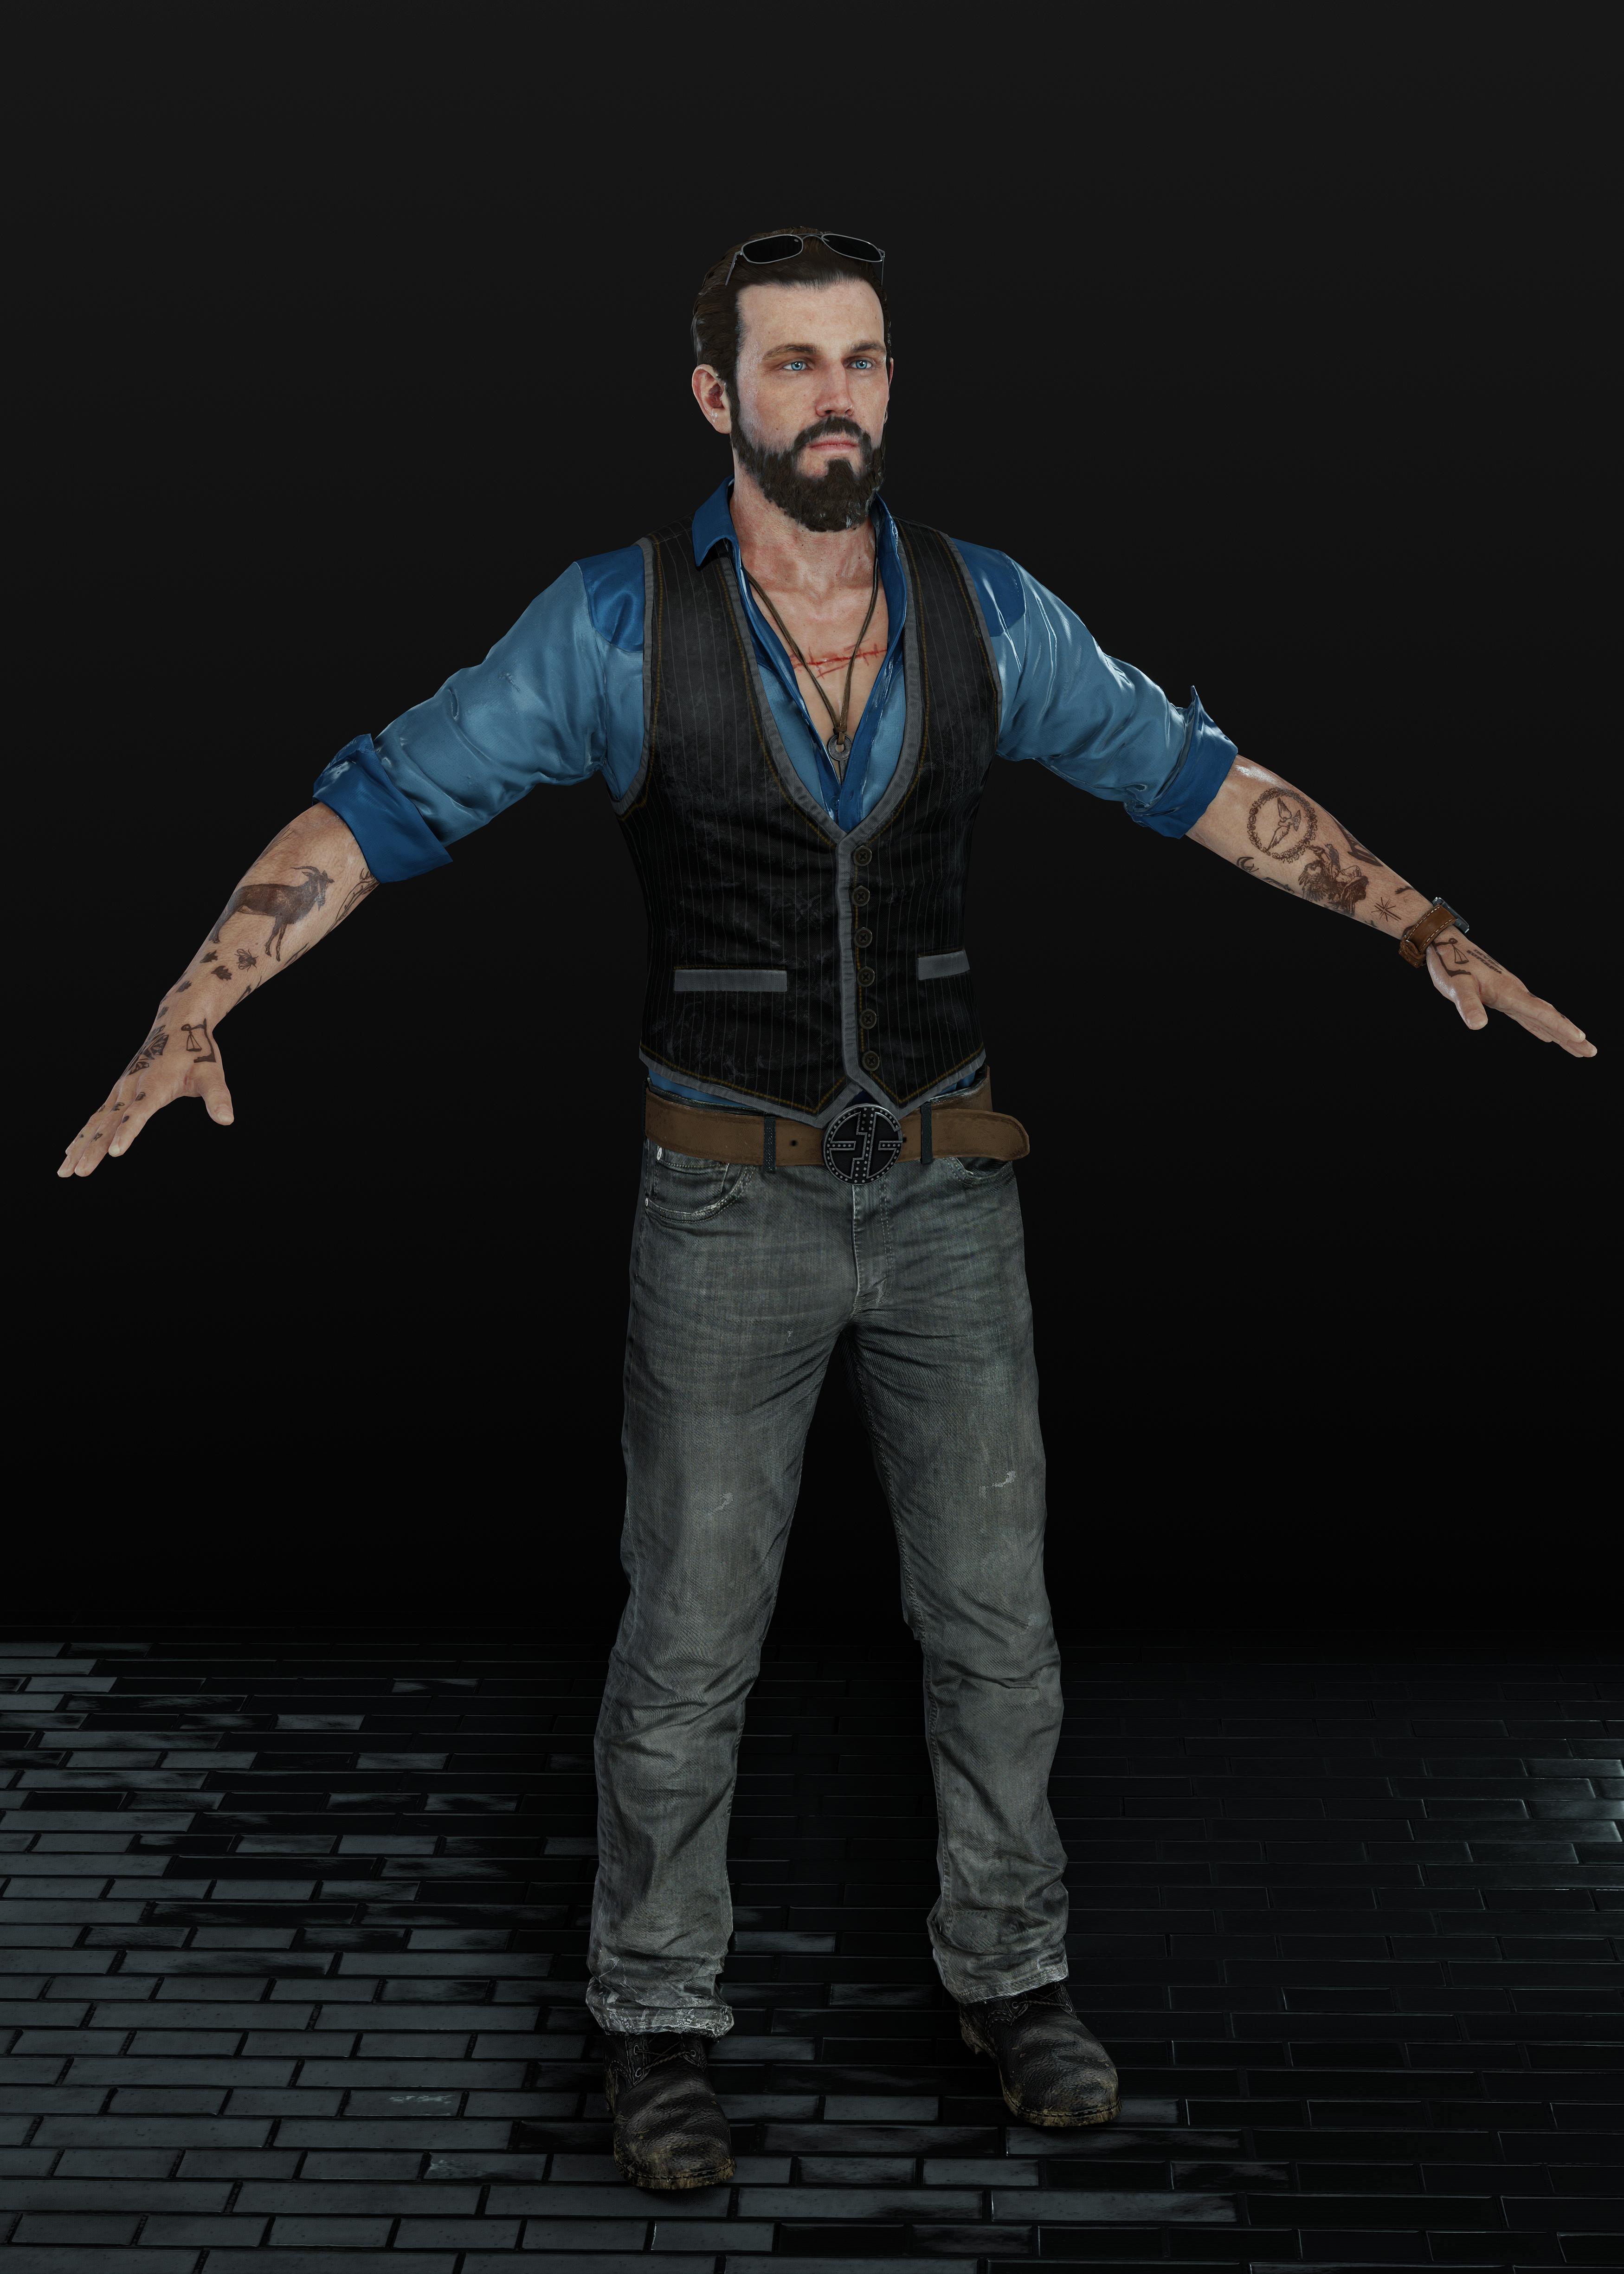 Far Cry 5 John Seed By Heliosal On Deviantart